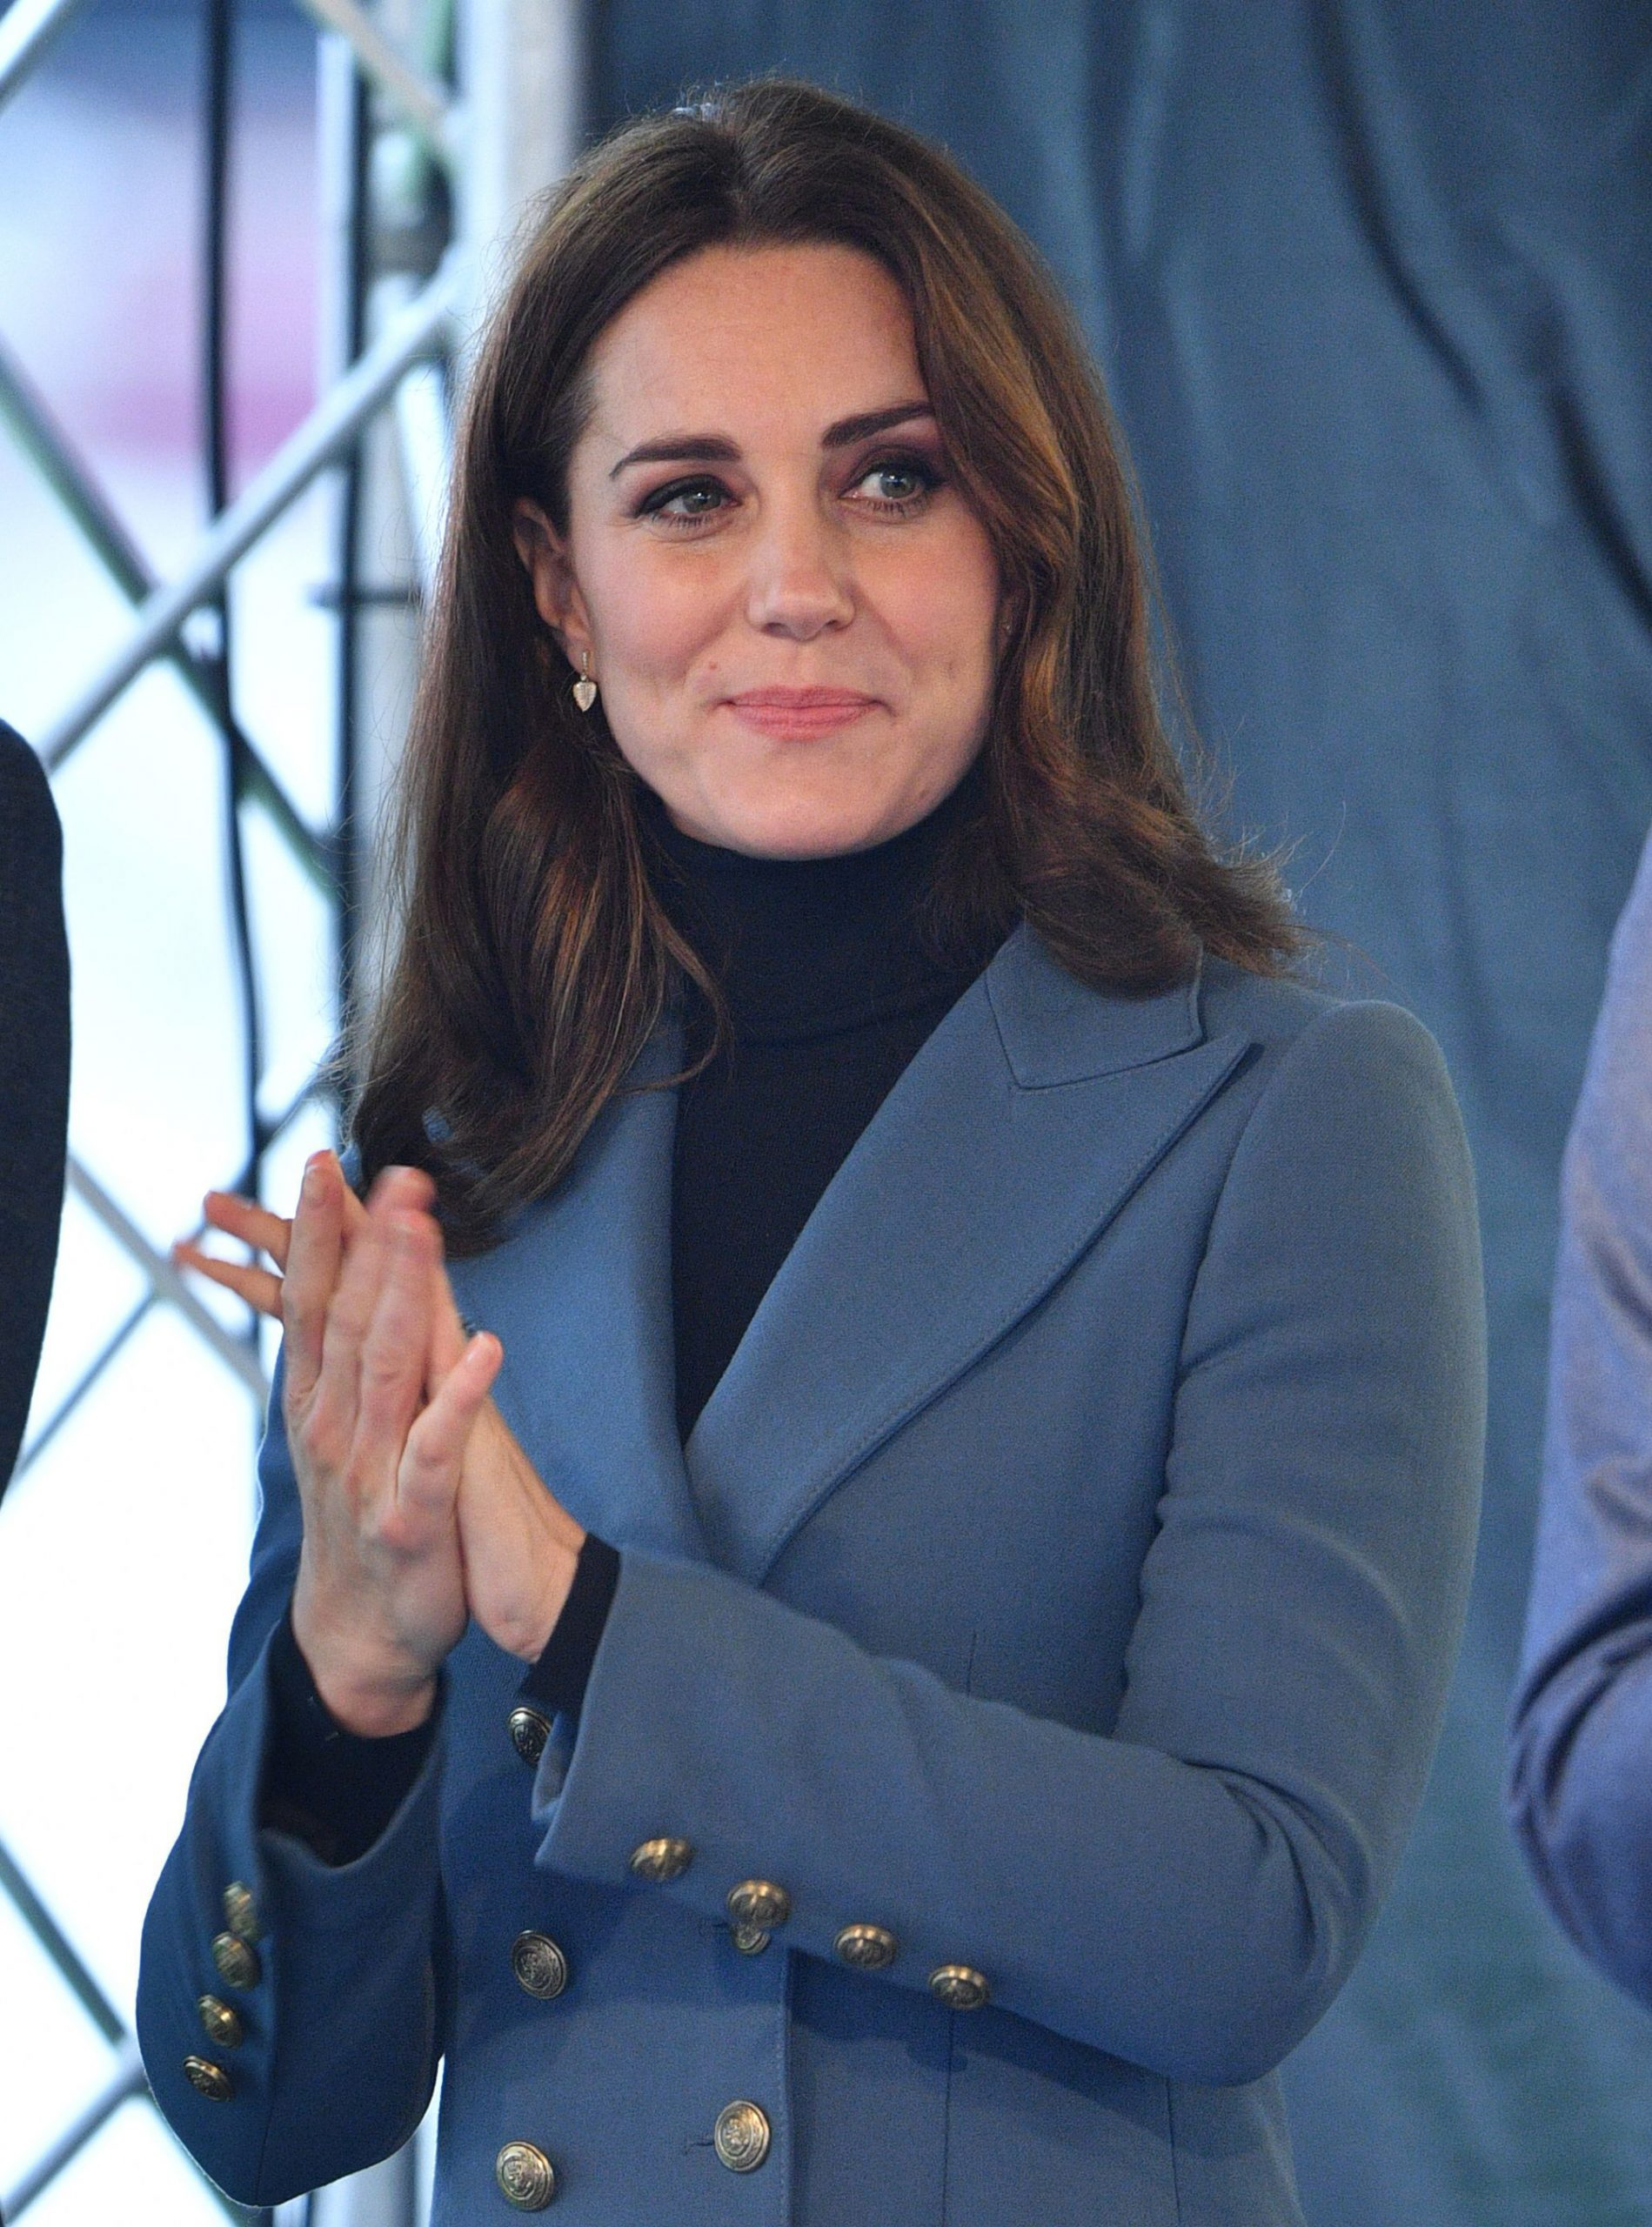 kate-professional-royal